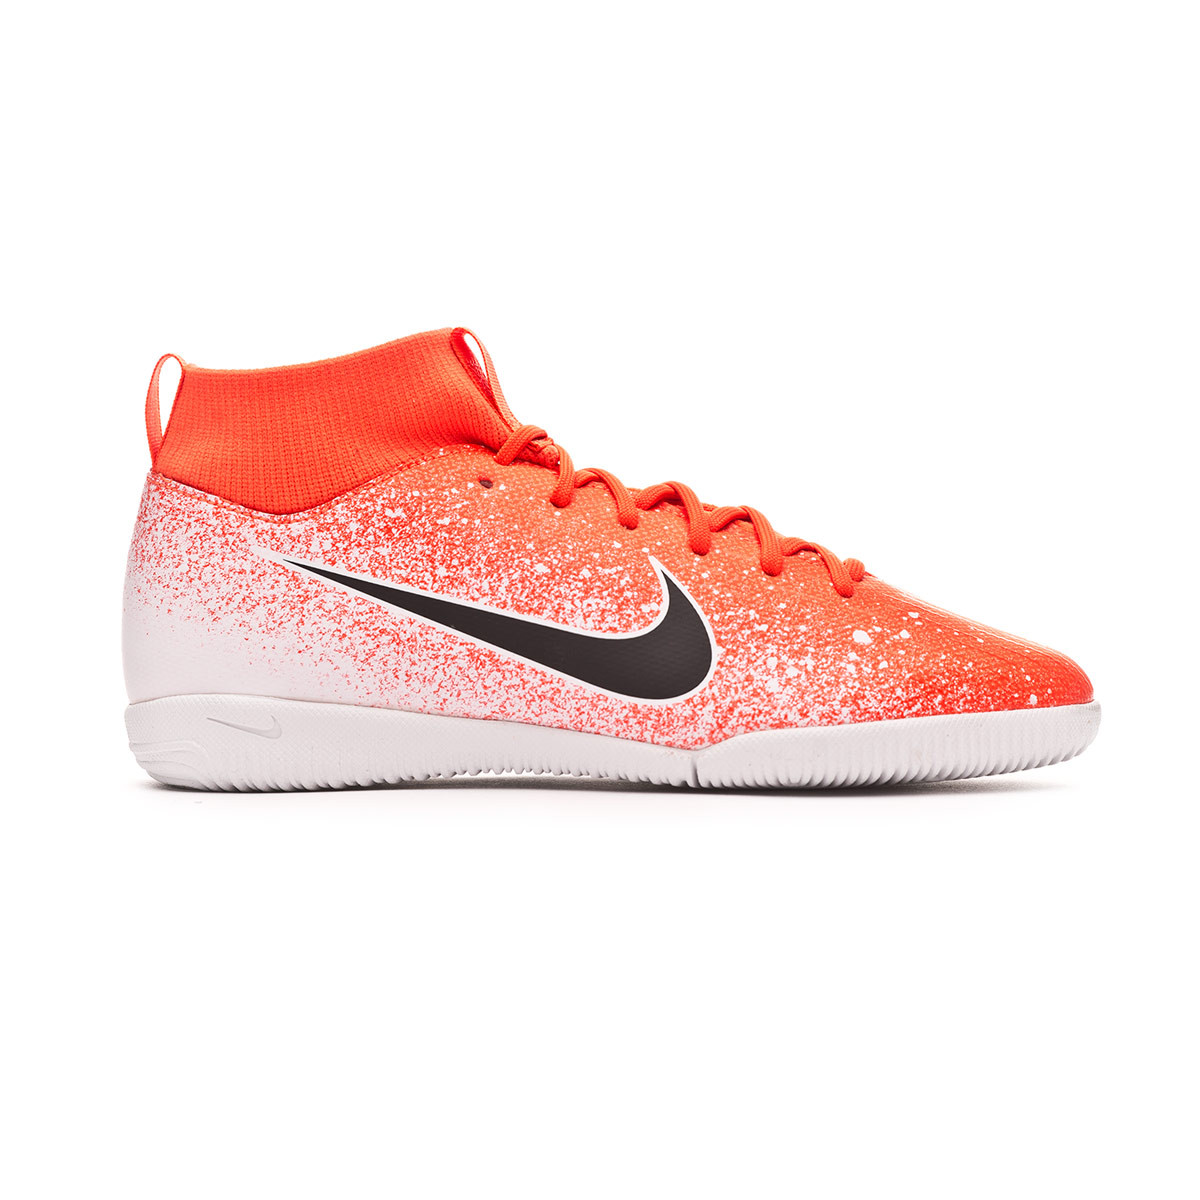 huge discount e9e45 0cef4 Chaussure de futsal Nike Mercurial SuperflyX VI Academy IC enfant Hyper  crimson-Black-White - Boutique de football Fútbol Emotion